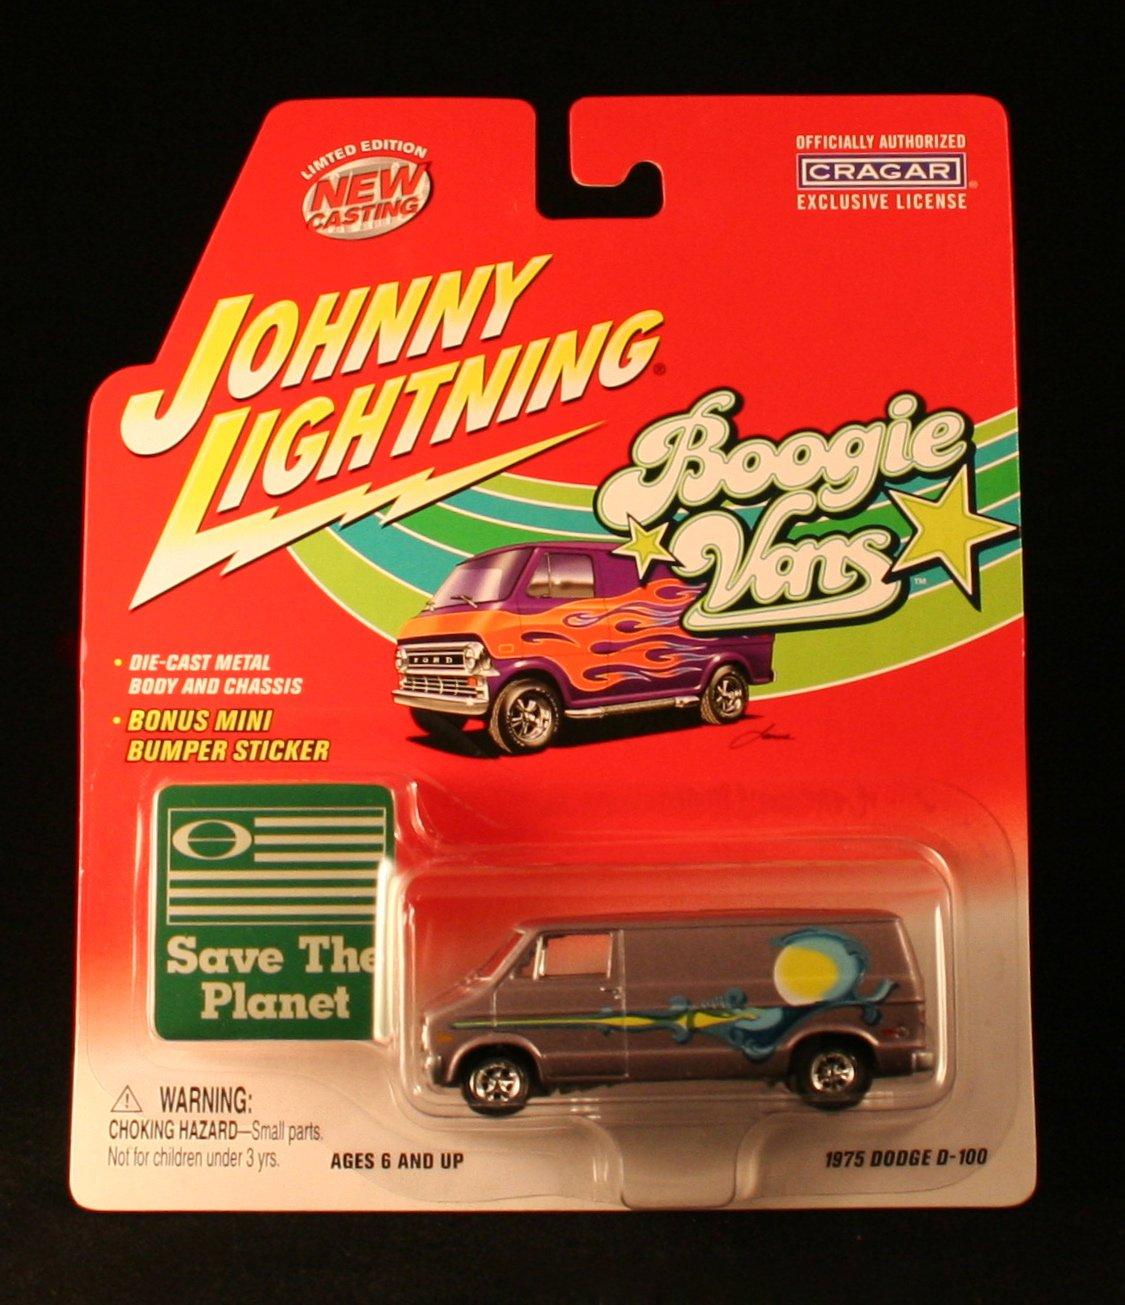 1975 DODGE D100)  SILVER  Johnny Lightning 2002 BOOGIE VANS Release One 1 64 Scale Die Cast Vehicle